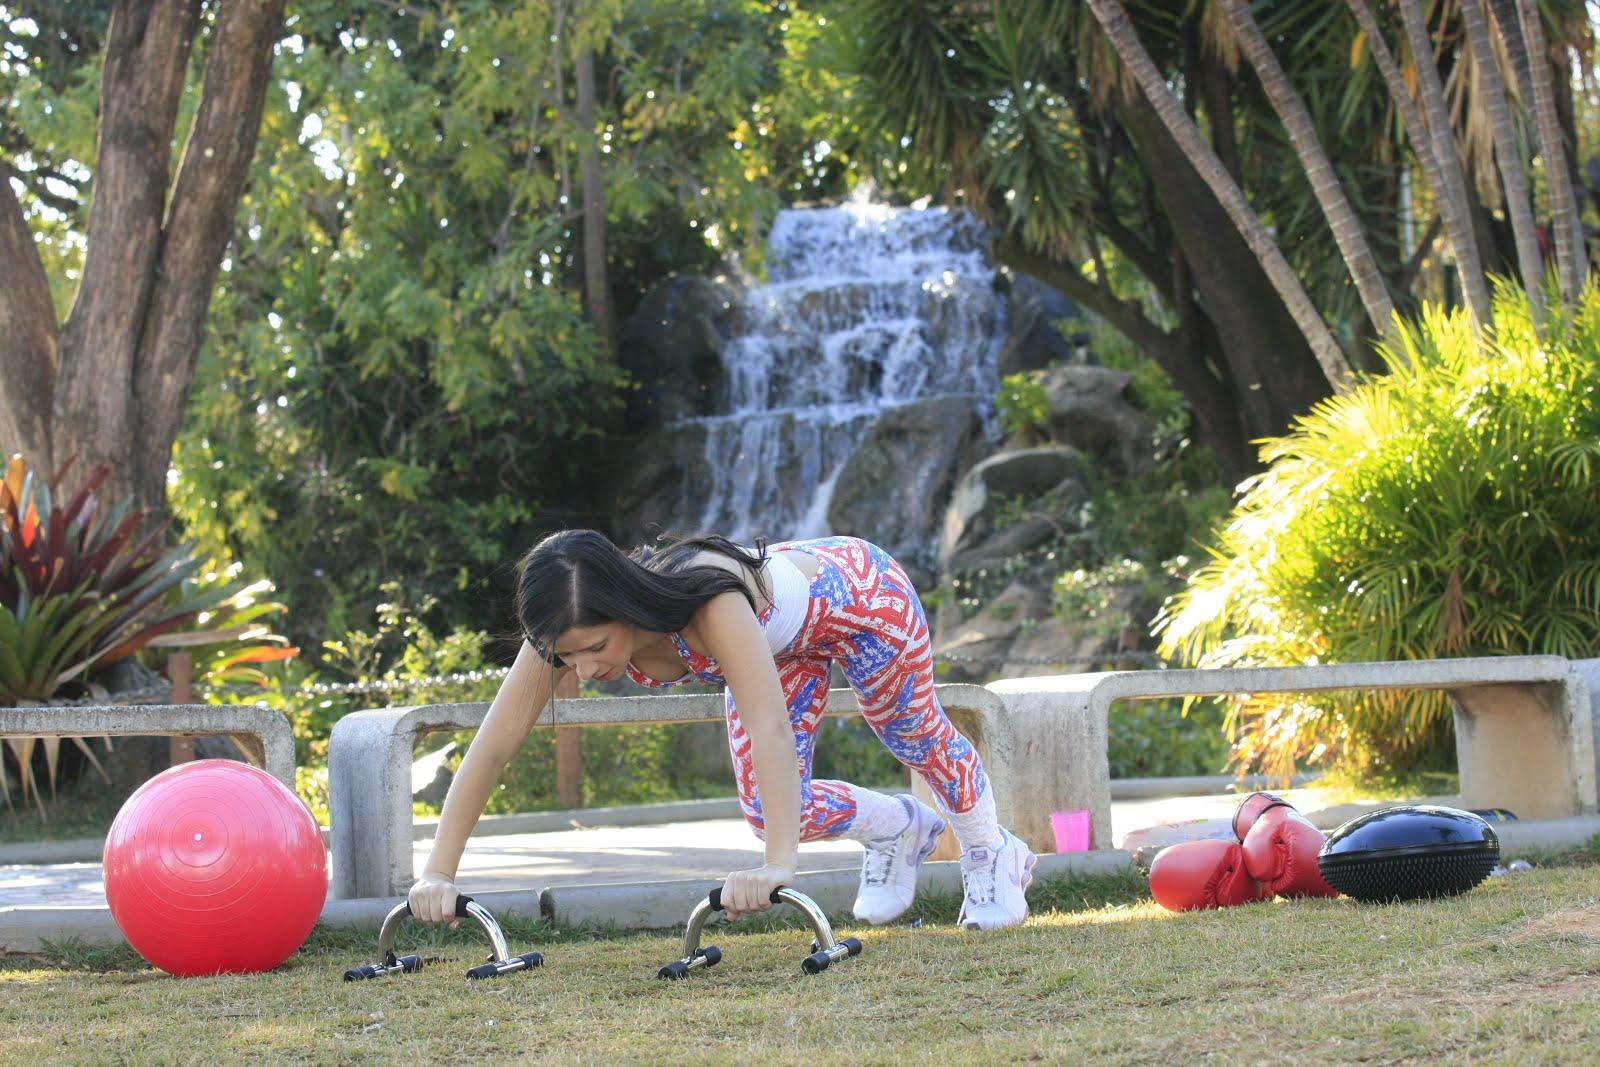 Personal Trainer Franciele Sezana